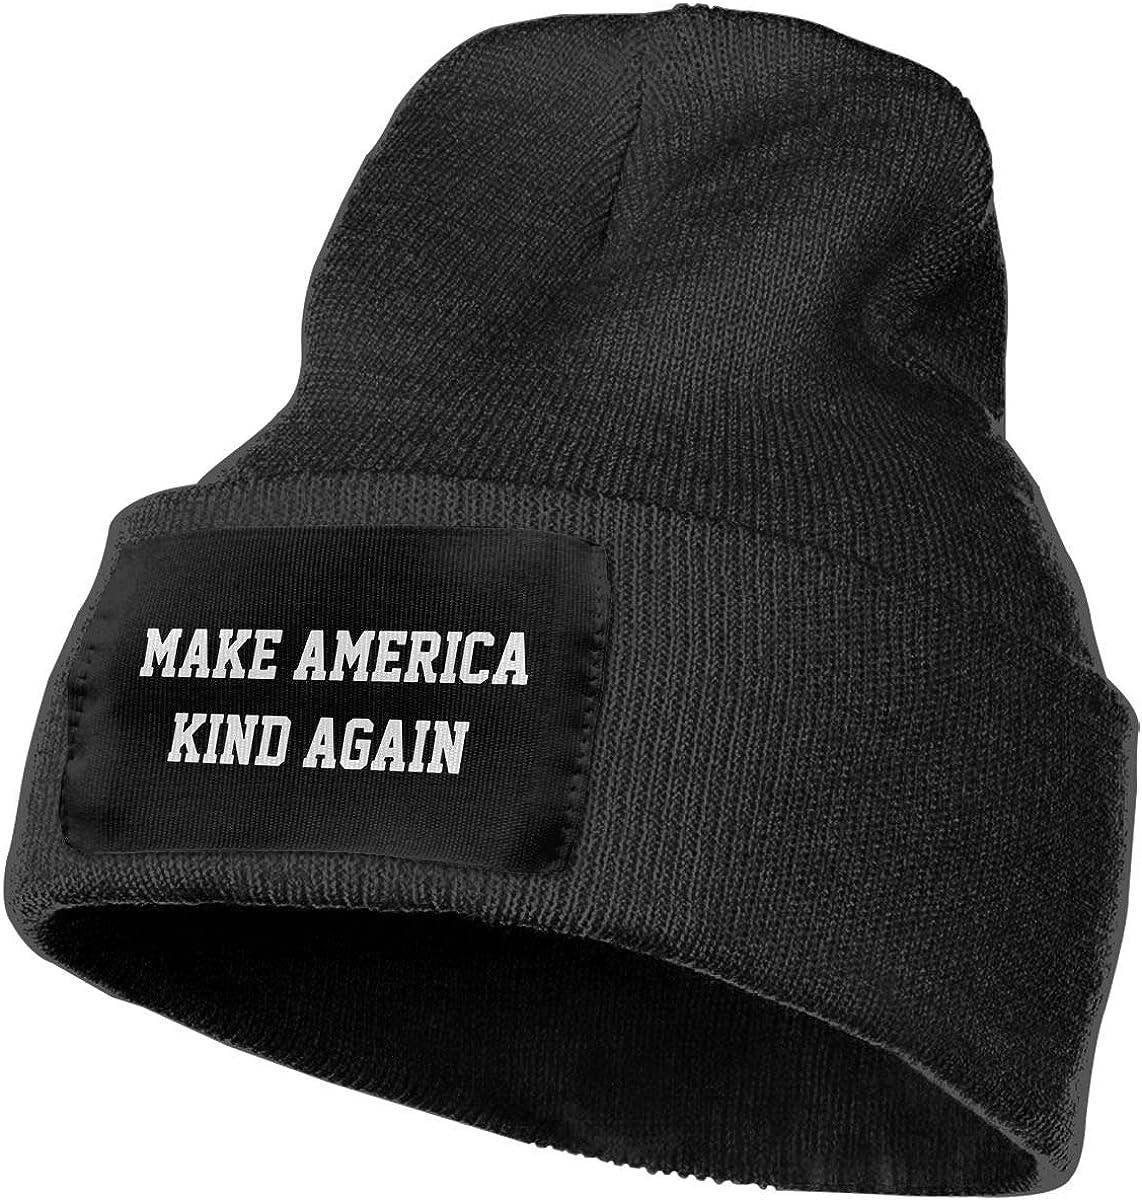 Men//Women Make America Kind Again Outdoor Warm Knit Beanies Hat Soft Winter Knit Caps